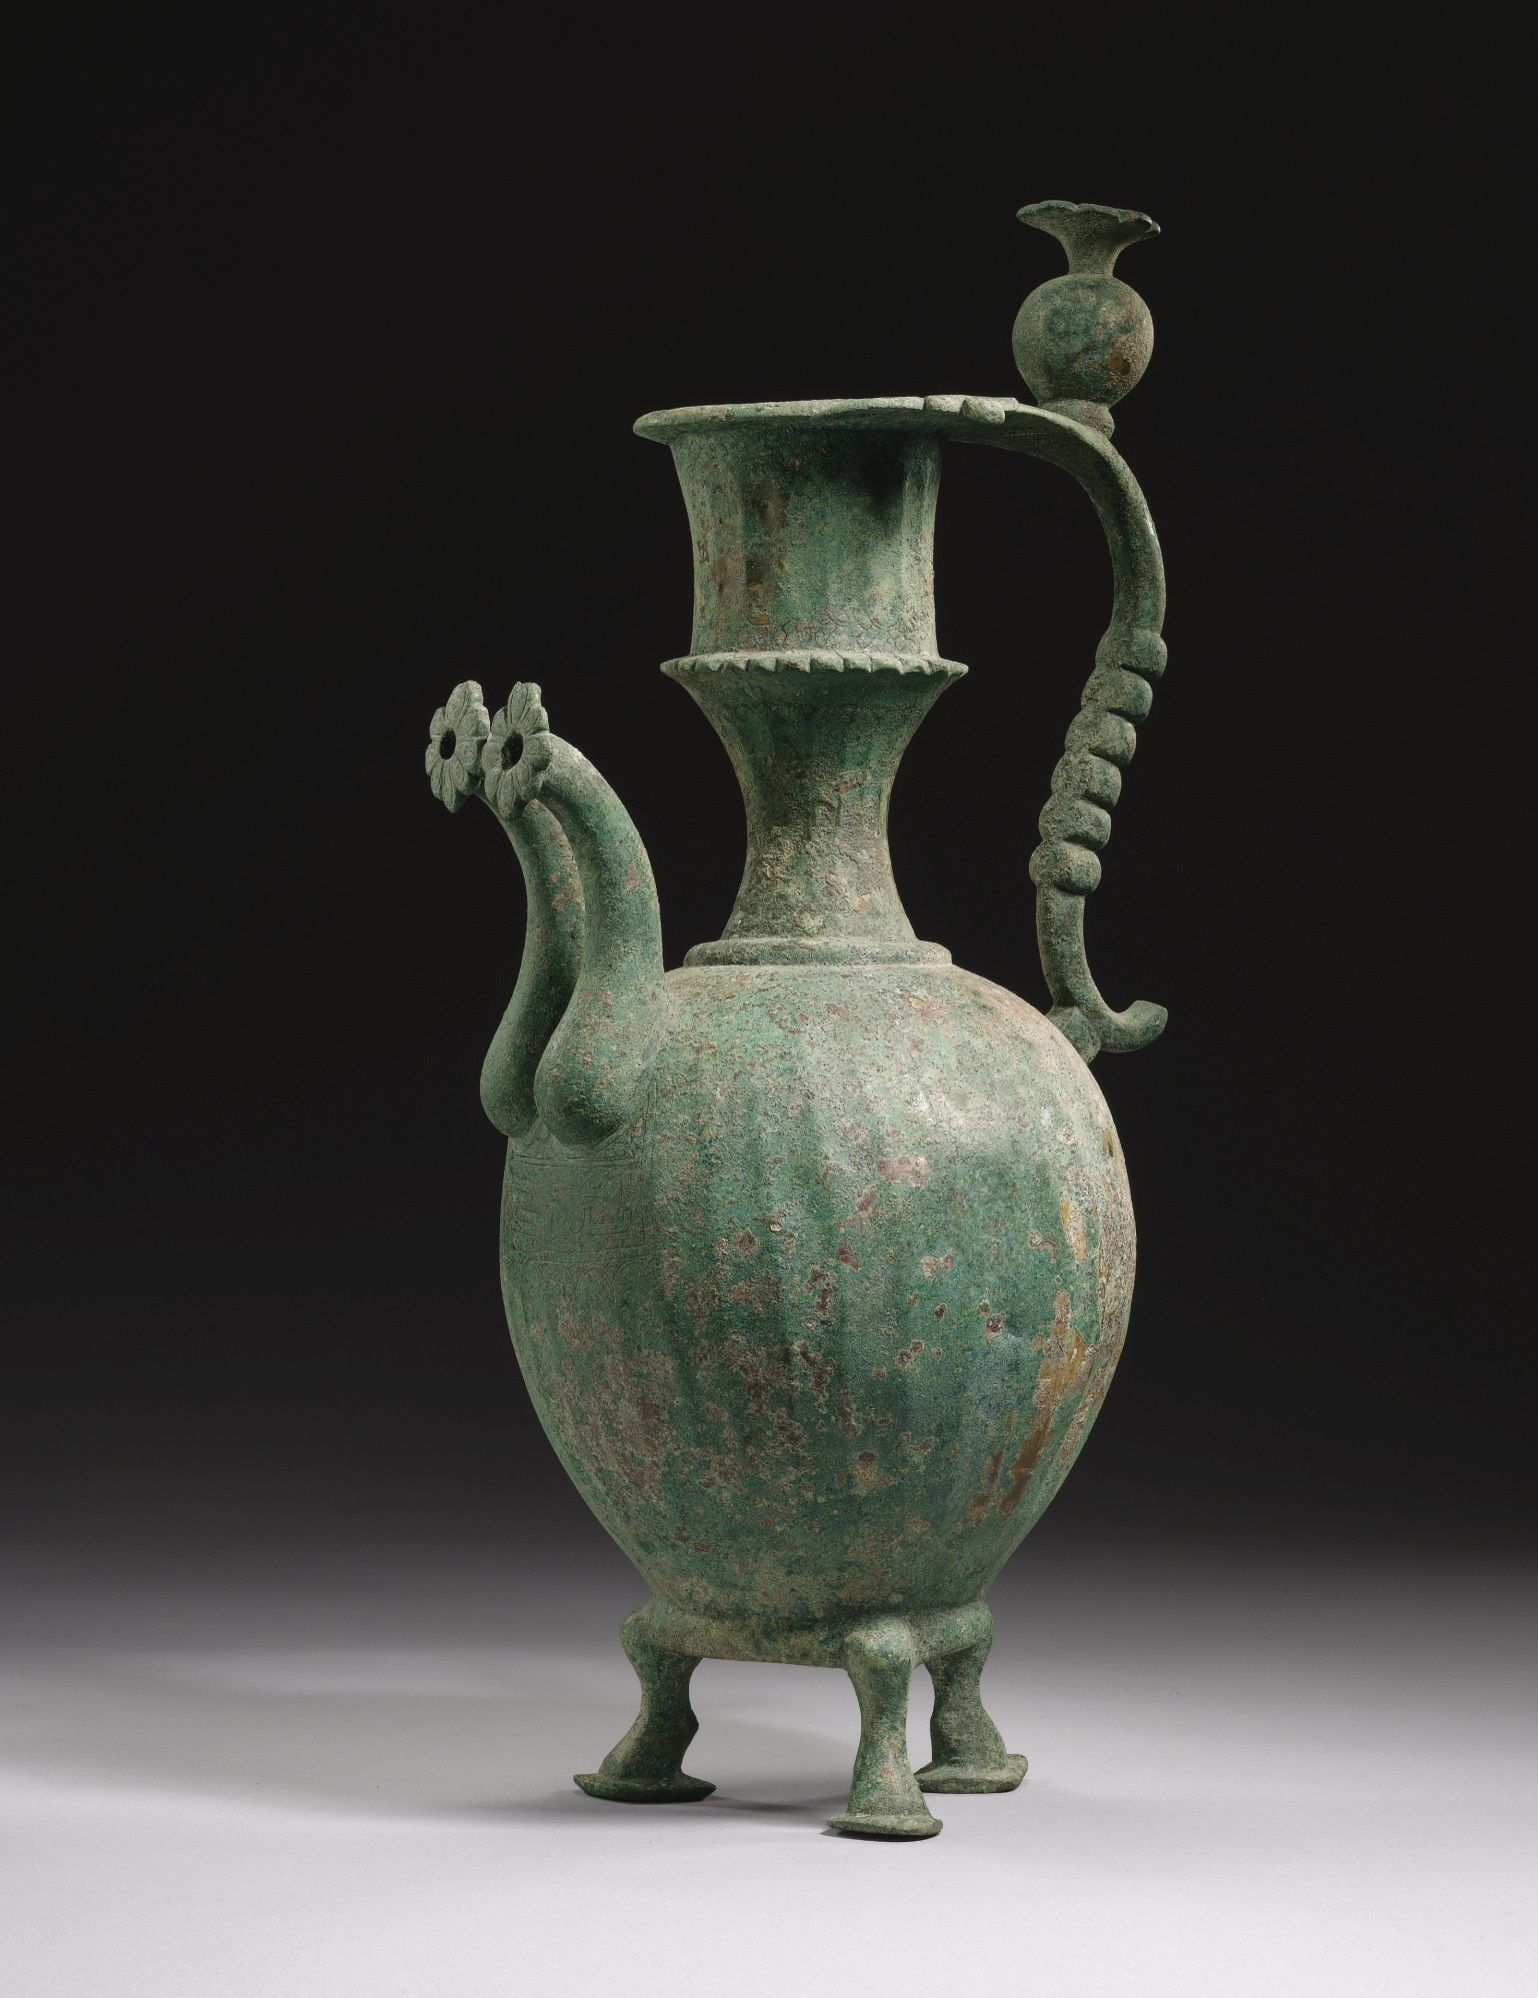 A large umayyad or early abbasid bronze ewer persia 8th century a large umayyad or early abbasid bronze ewer persia 8th century reviewsmspy